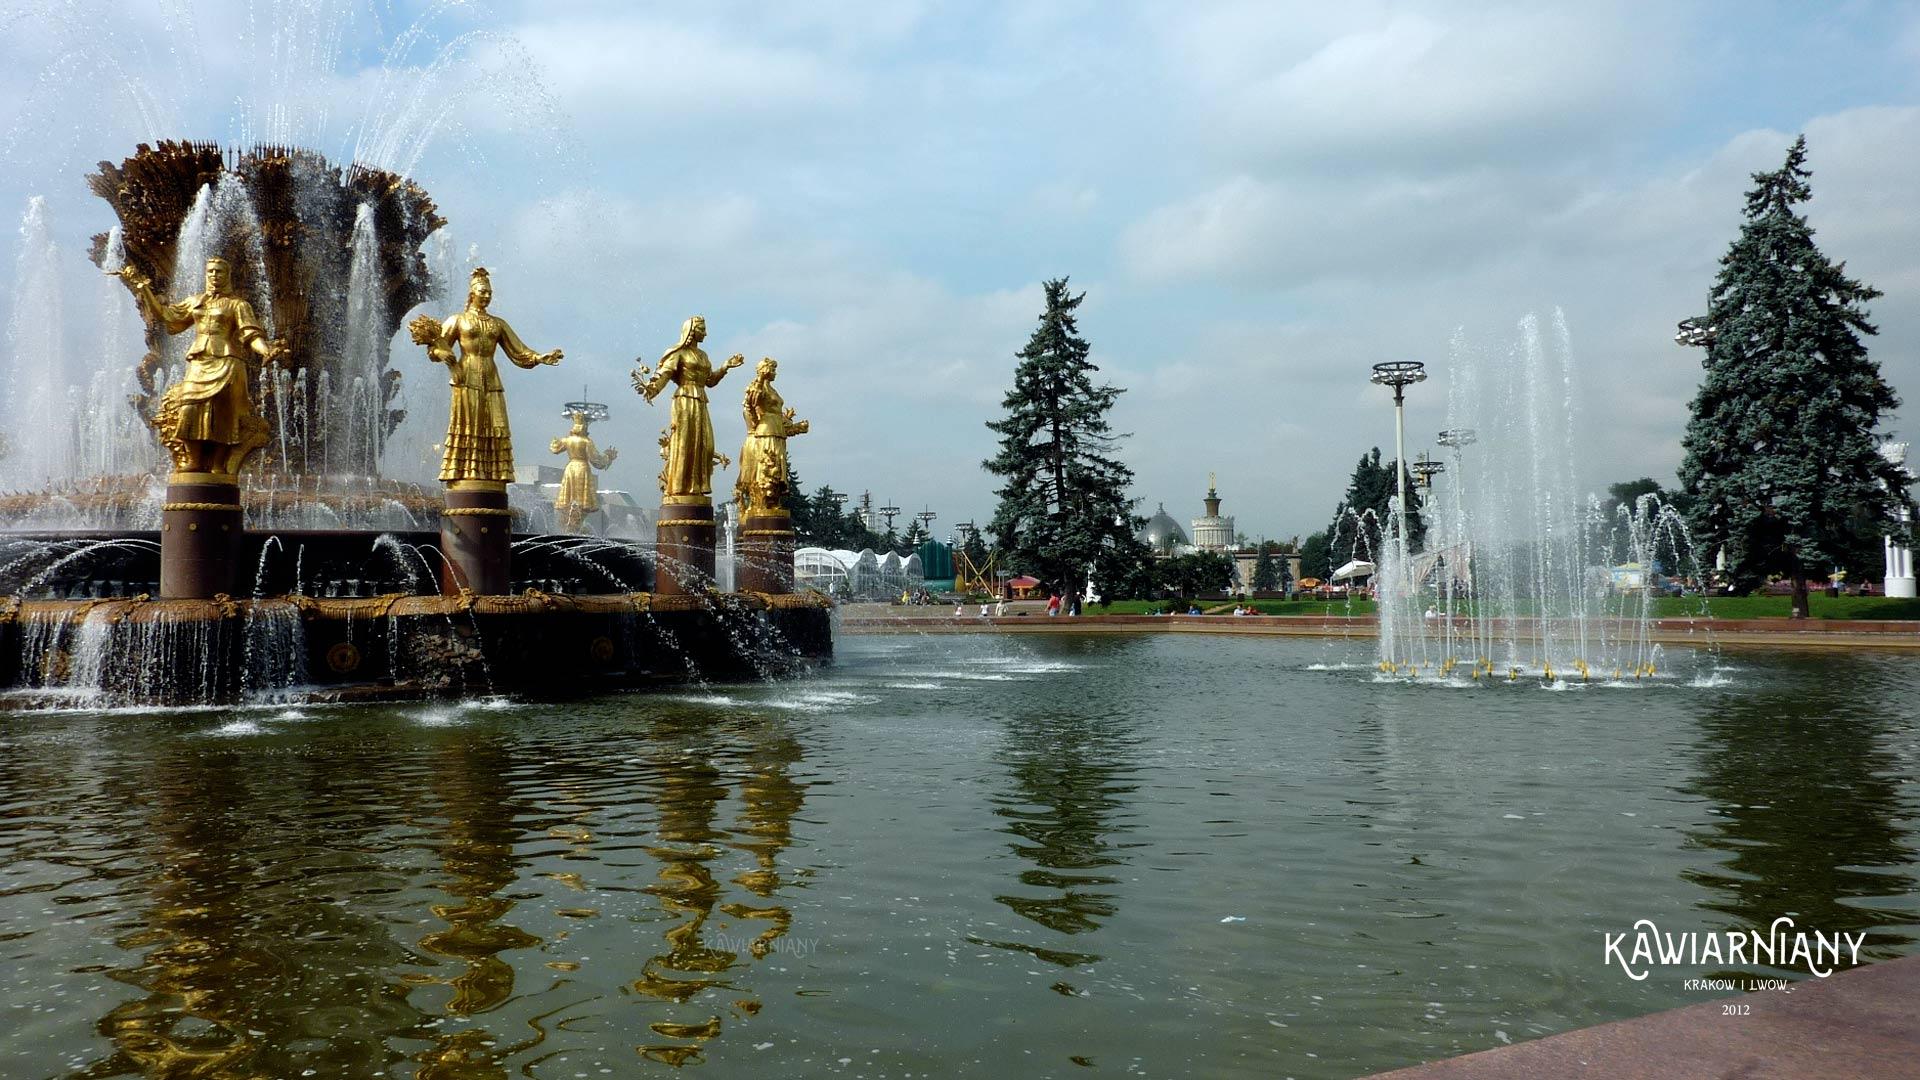 Frendship of Nations, Moskwa